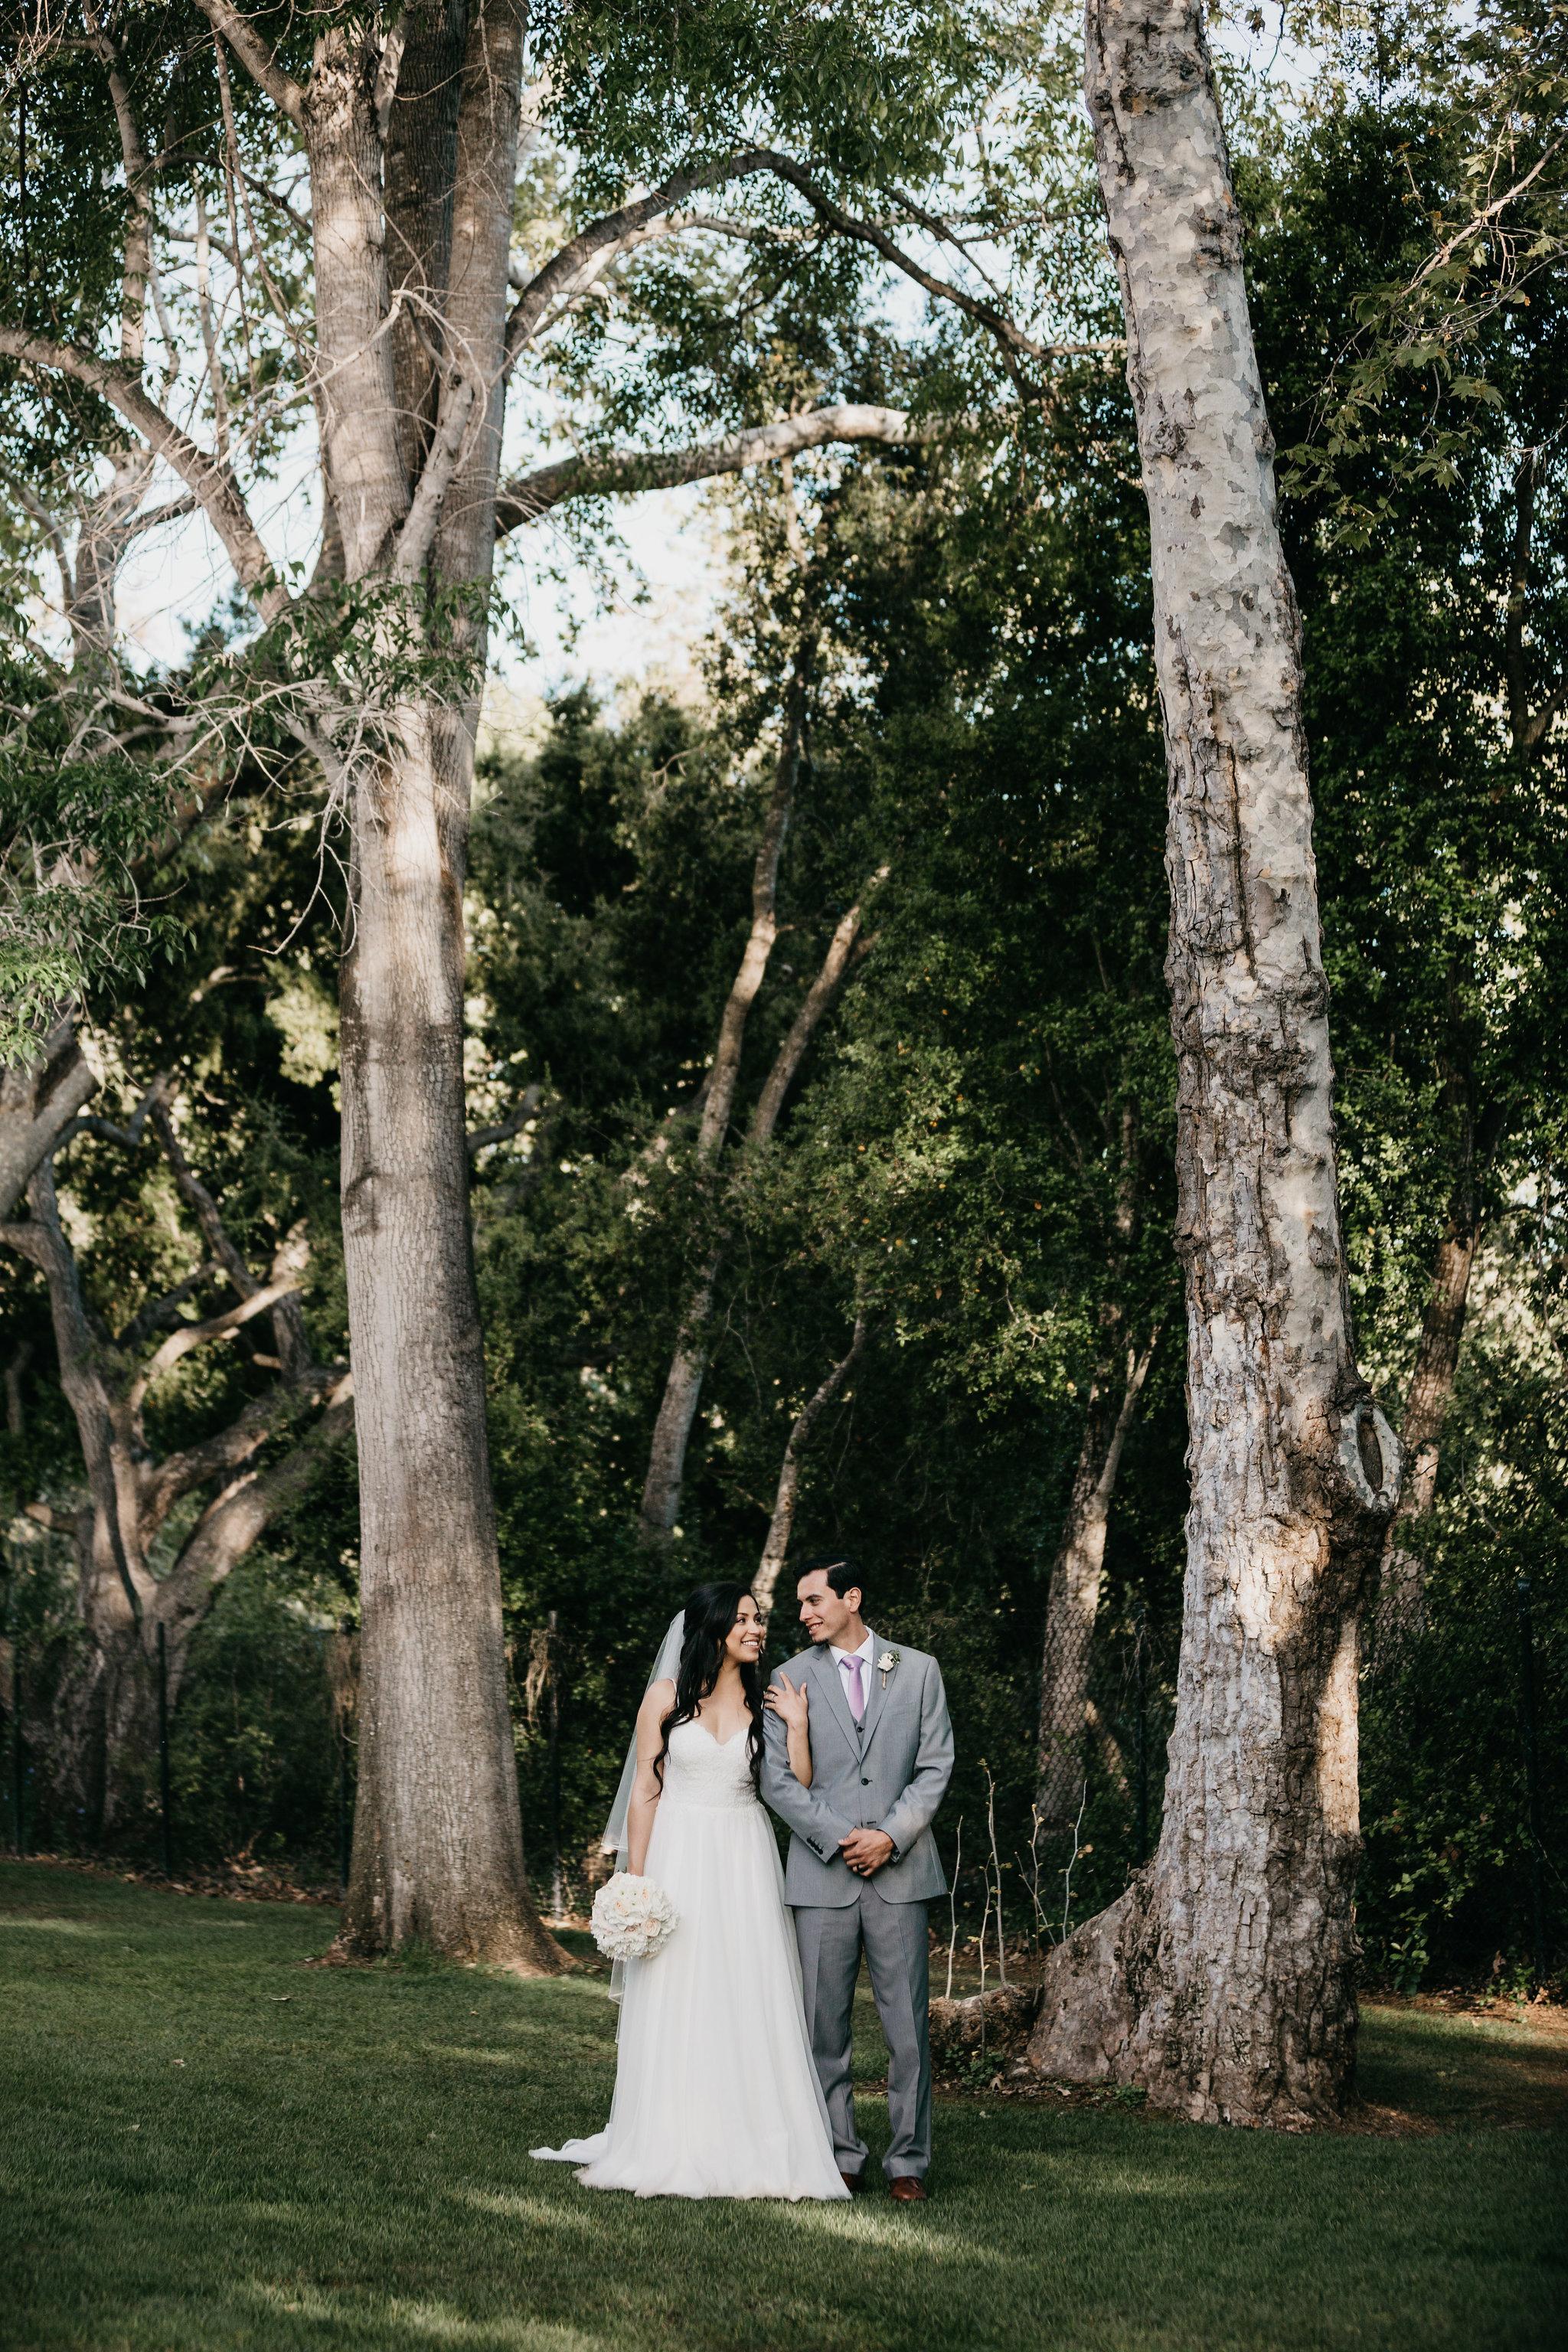 JoeandCelina_Romantics24.jpg